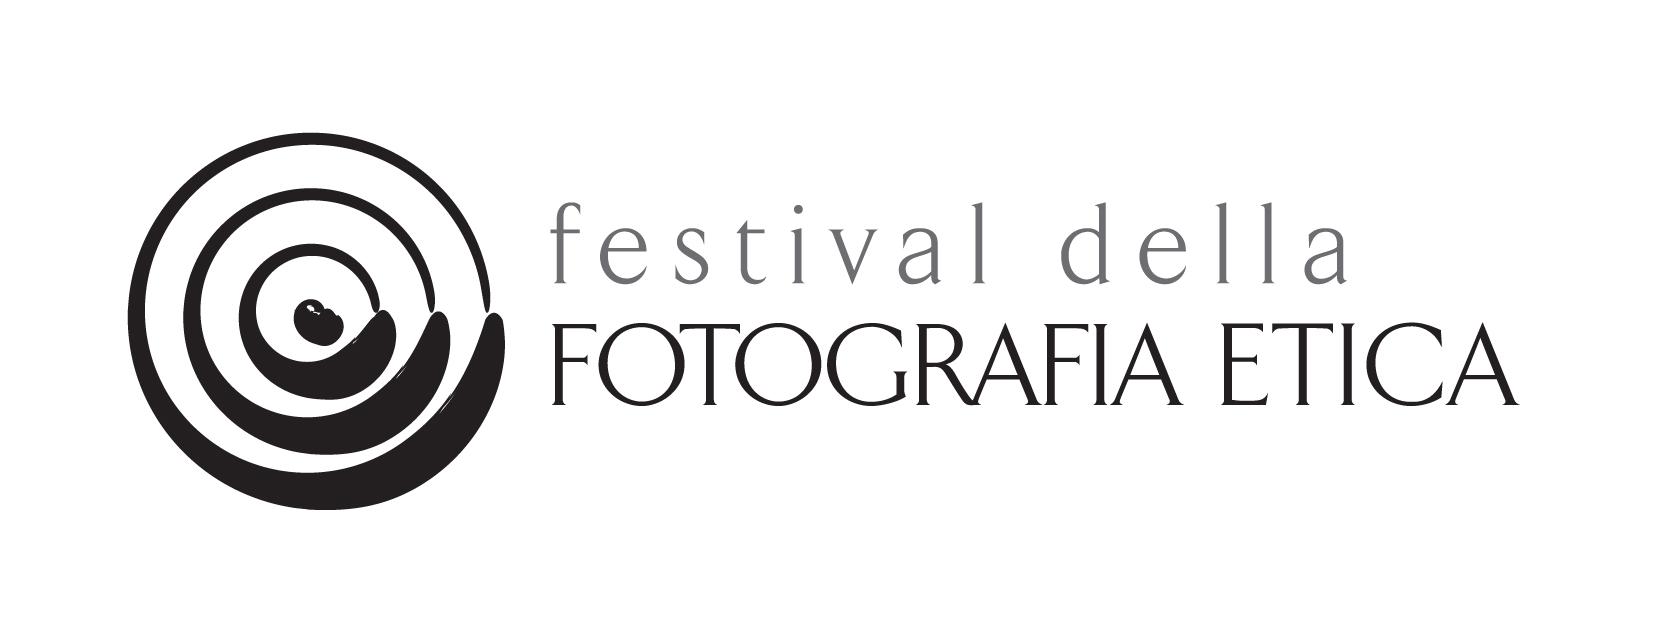 Festival- Fotografia- Etica.jpeg